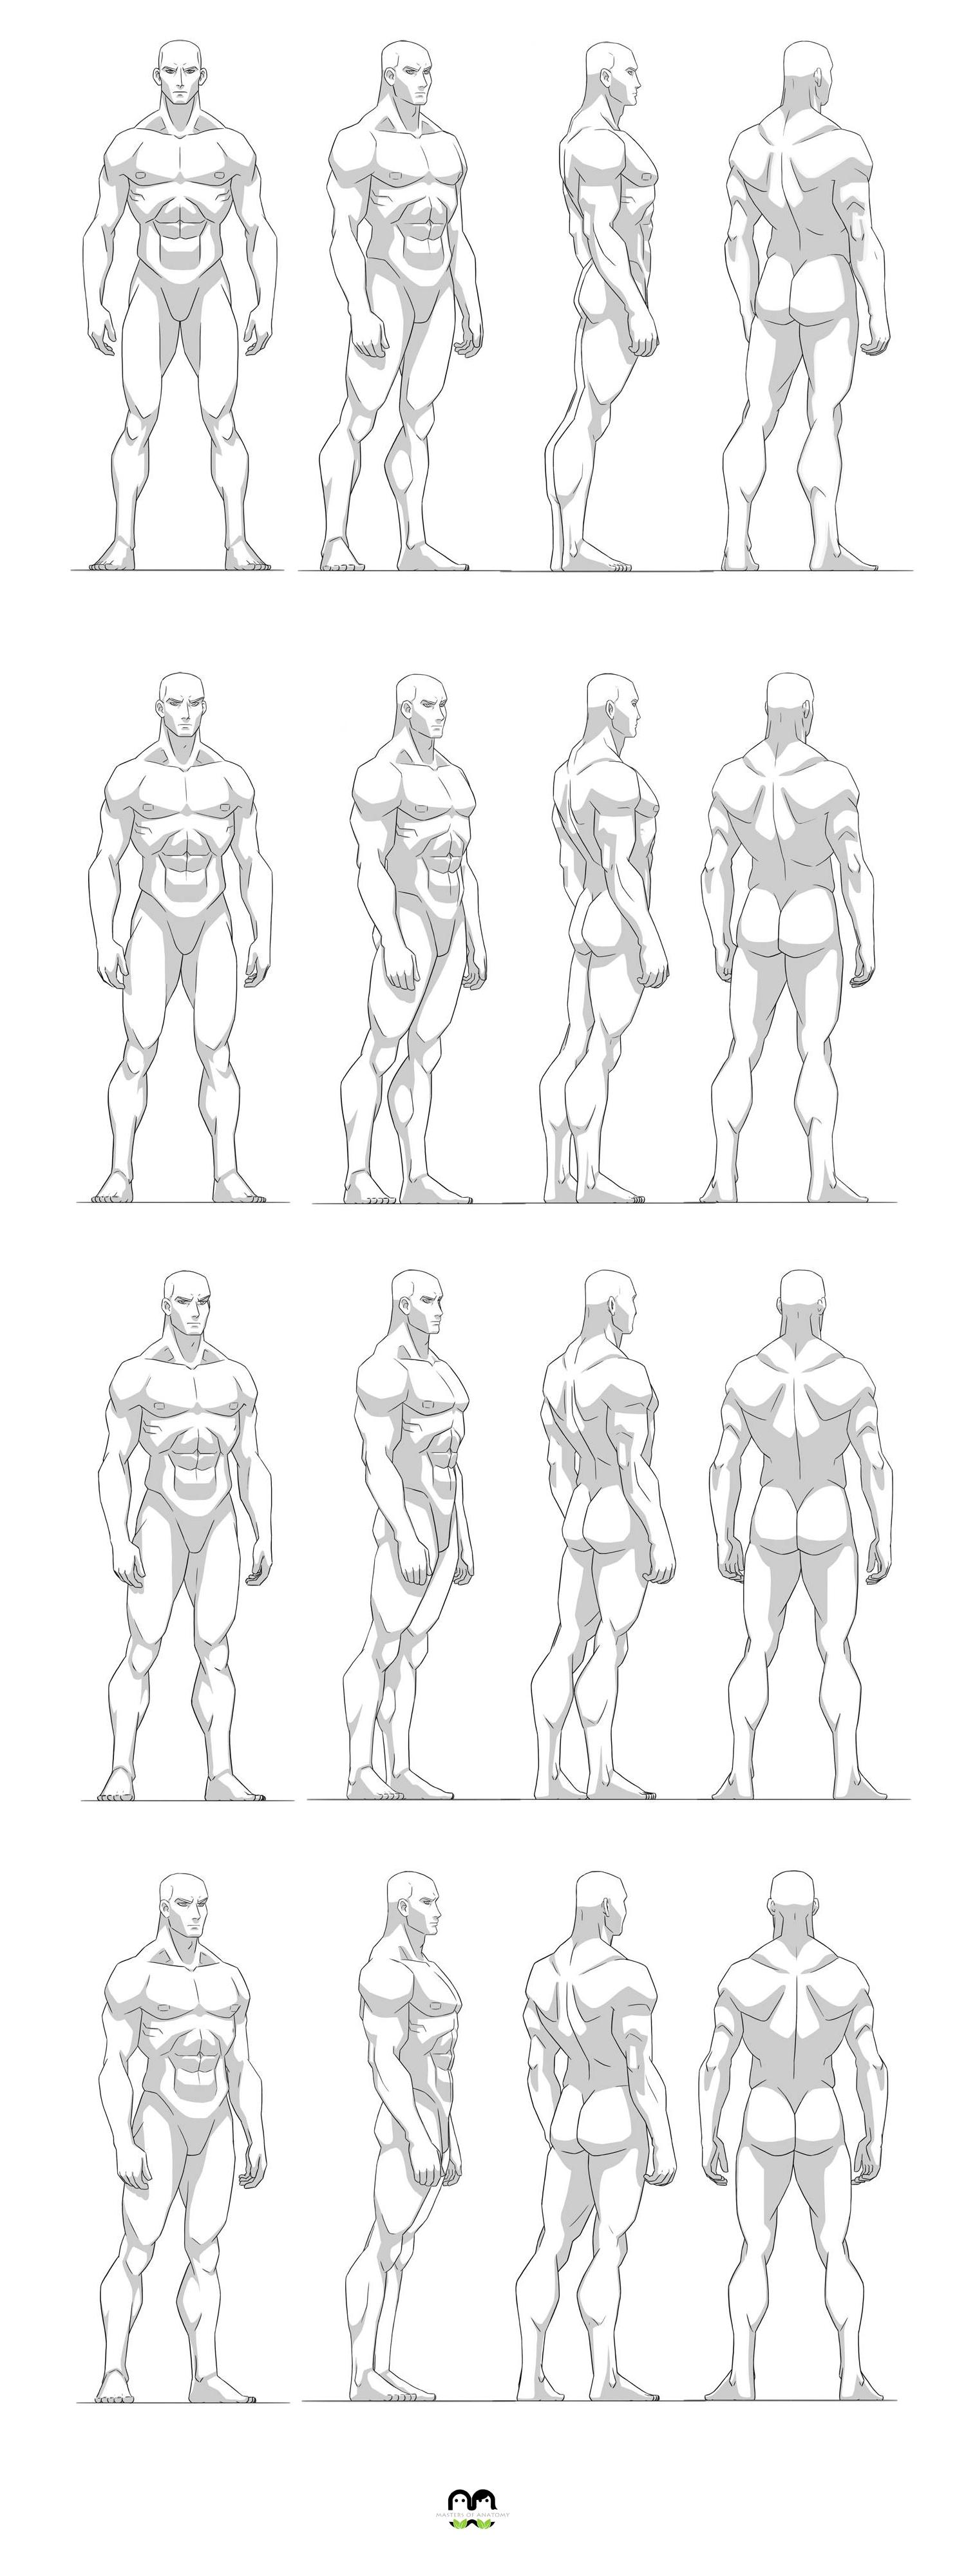 Blueprin Masculina bombada | Dibujo humano | Pinterest | Anatomía ...